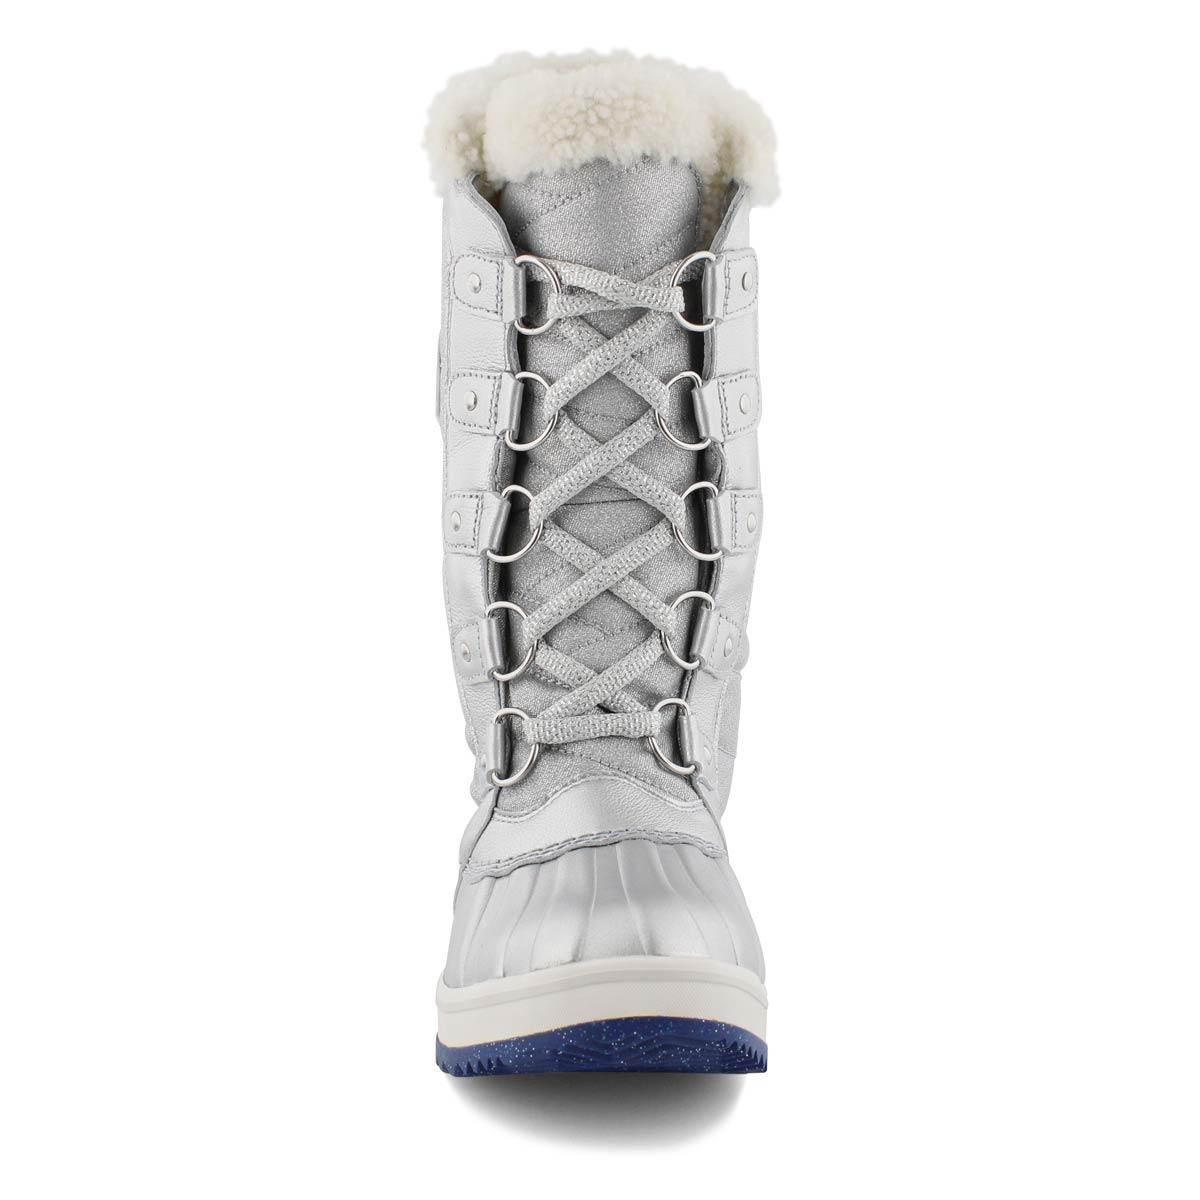 Lds DisneyTofino II Frozen sil wtpf boot